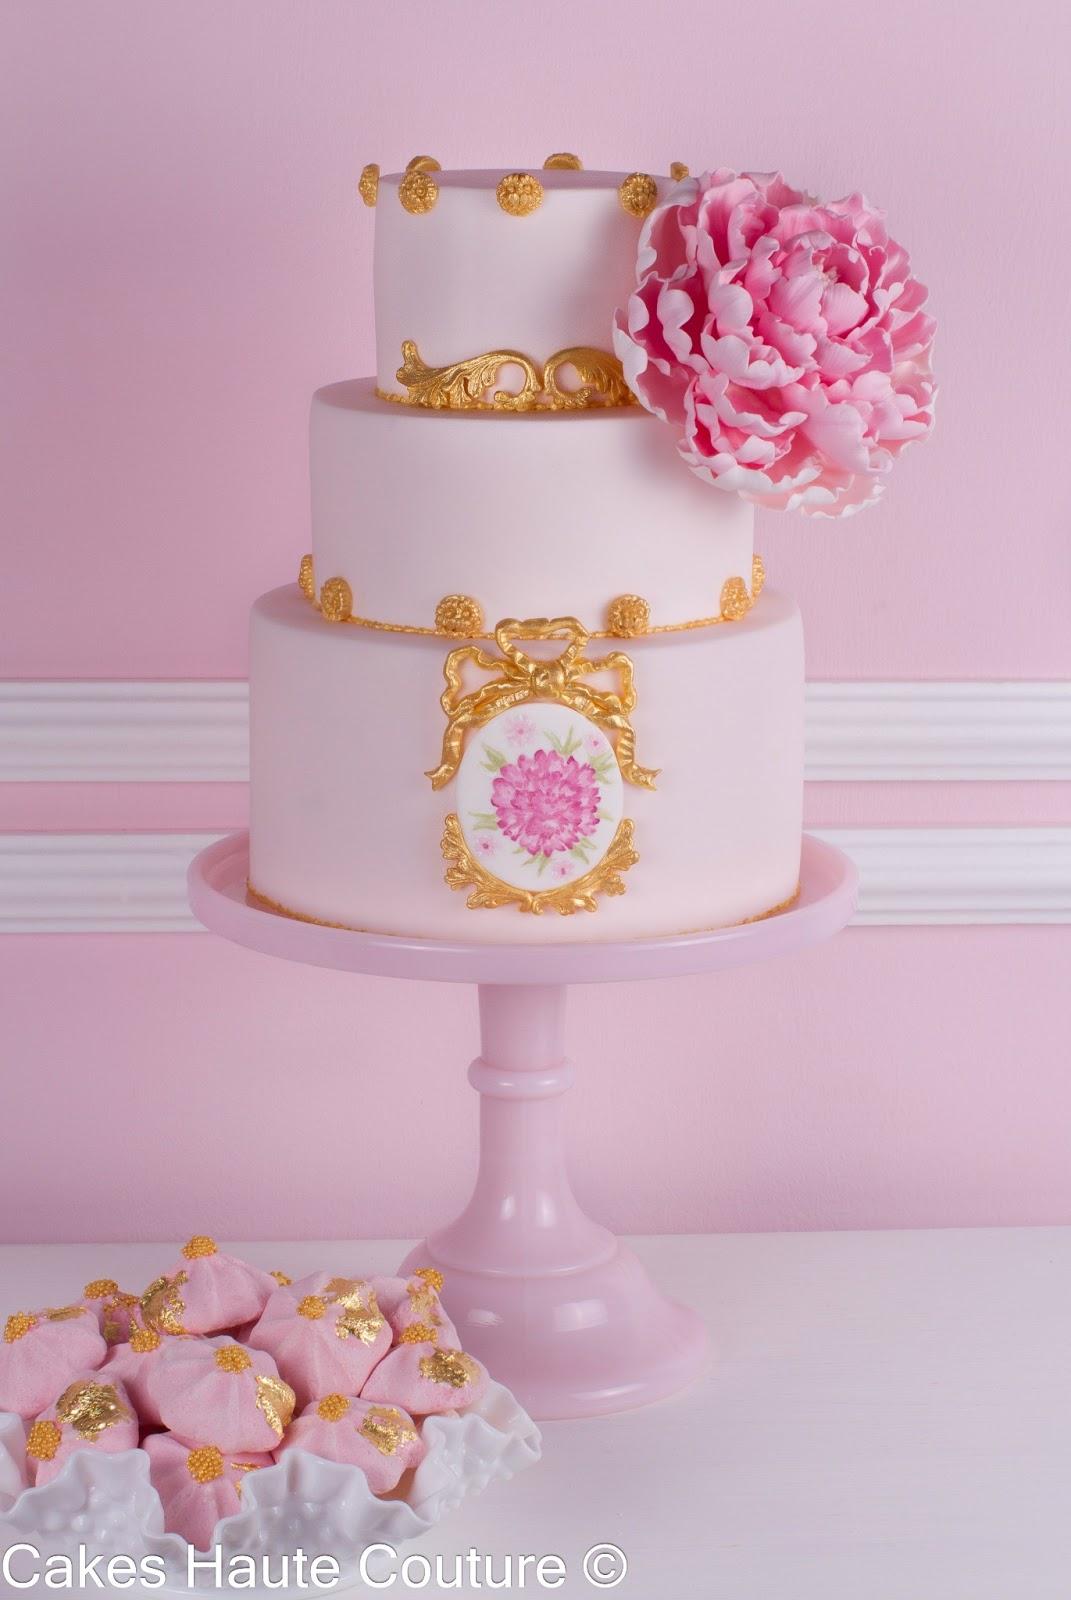 Cakes Haute Couture - El Blog de Patricia Arribálzaga: junio 2013